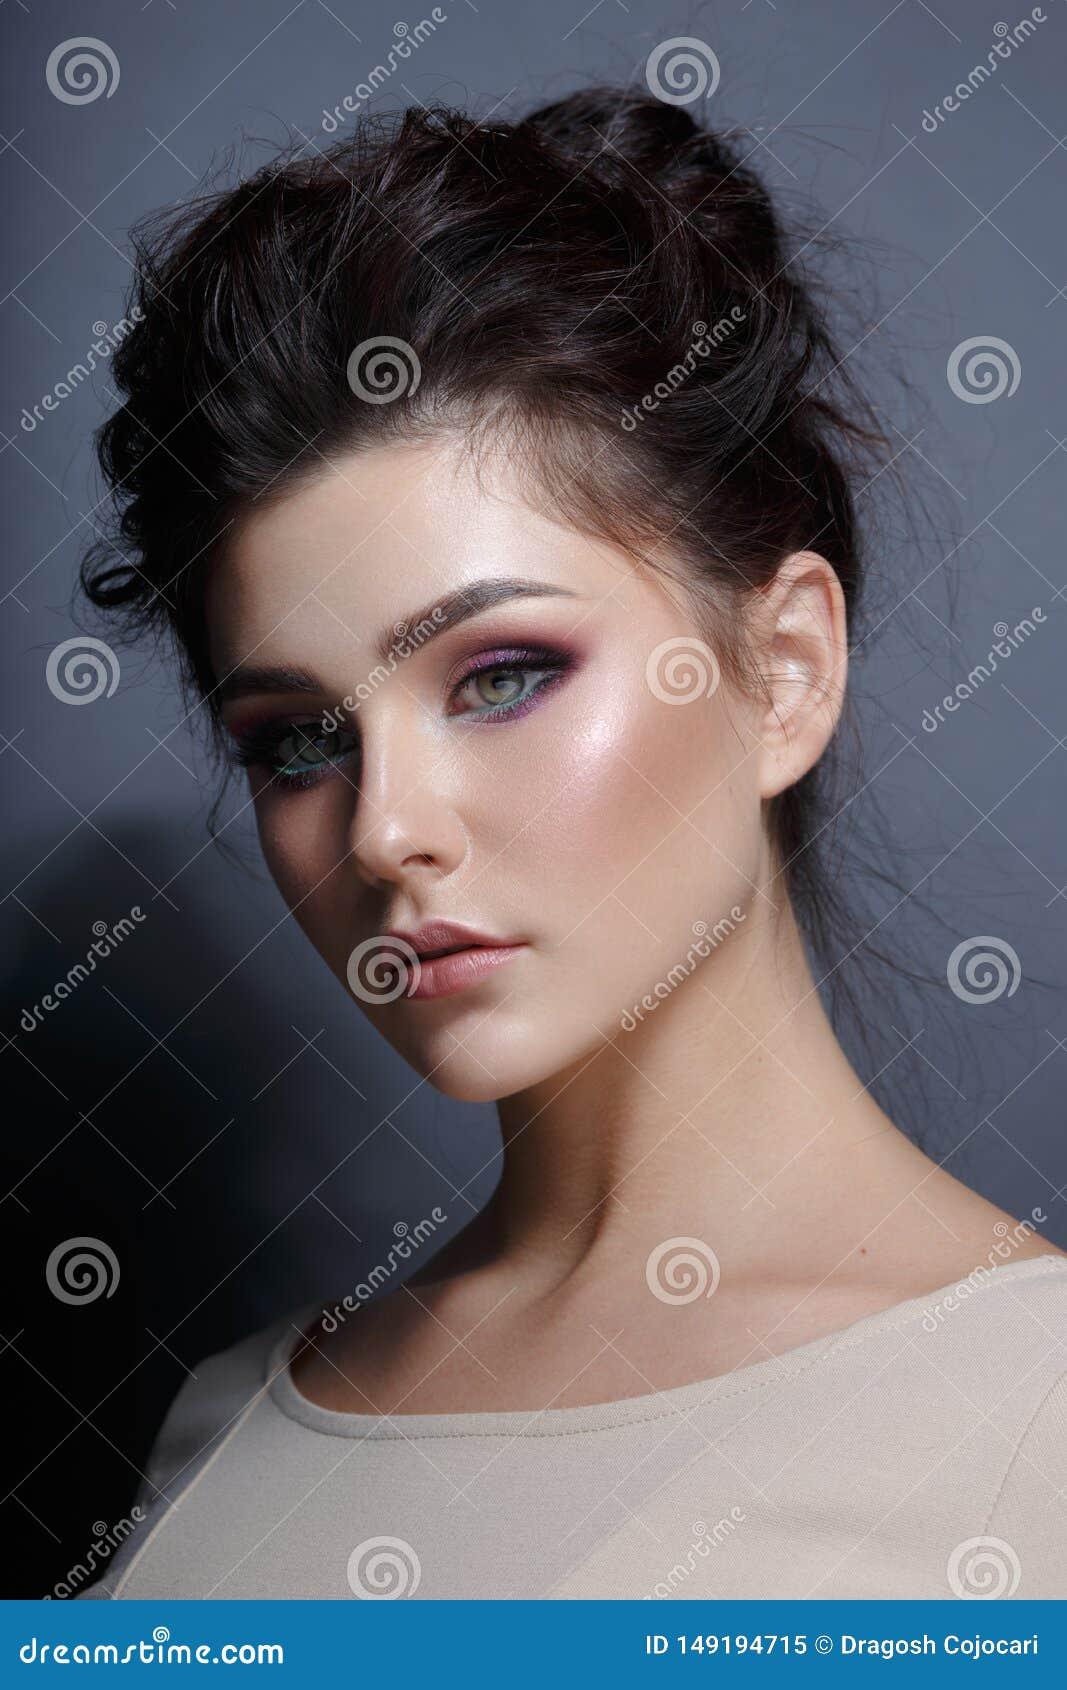 Retrato del perfil de una mujer agraciada con maquillaje del superbe, mirando la c?mara Visi?n vertical